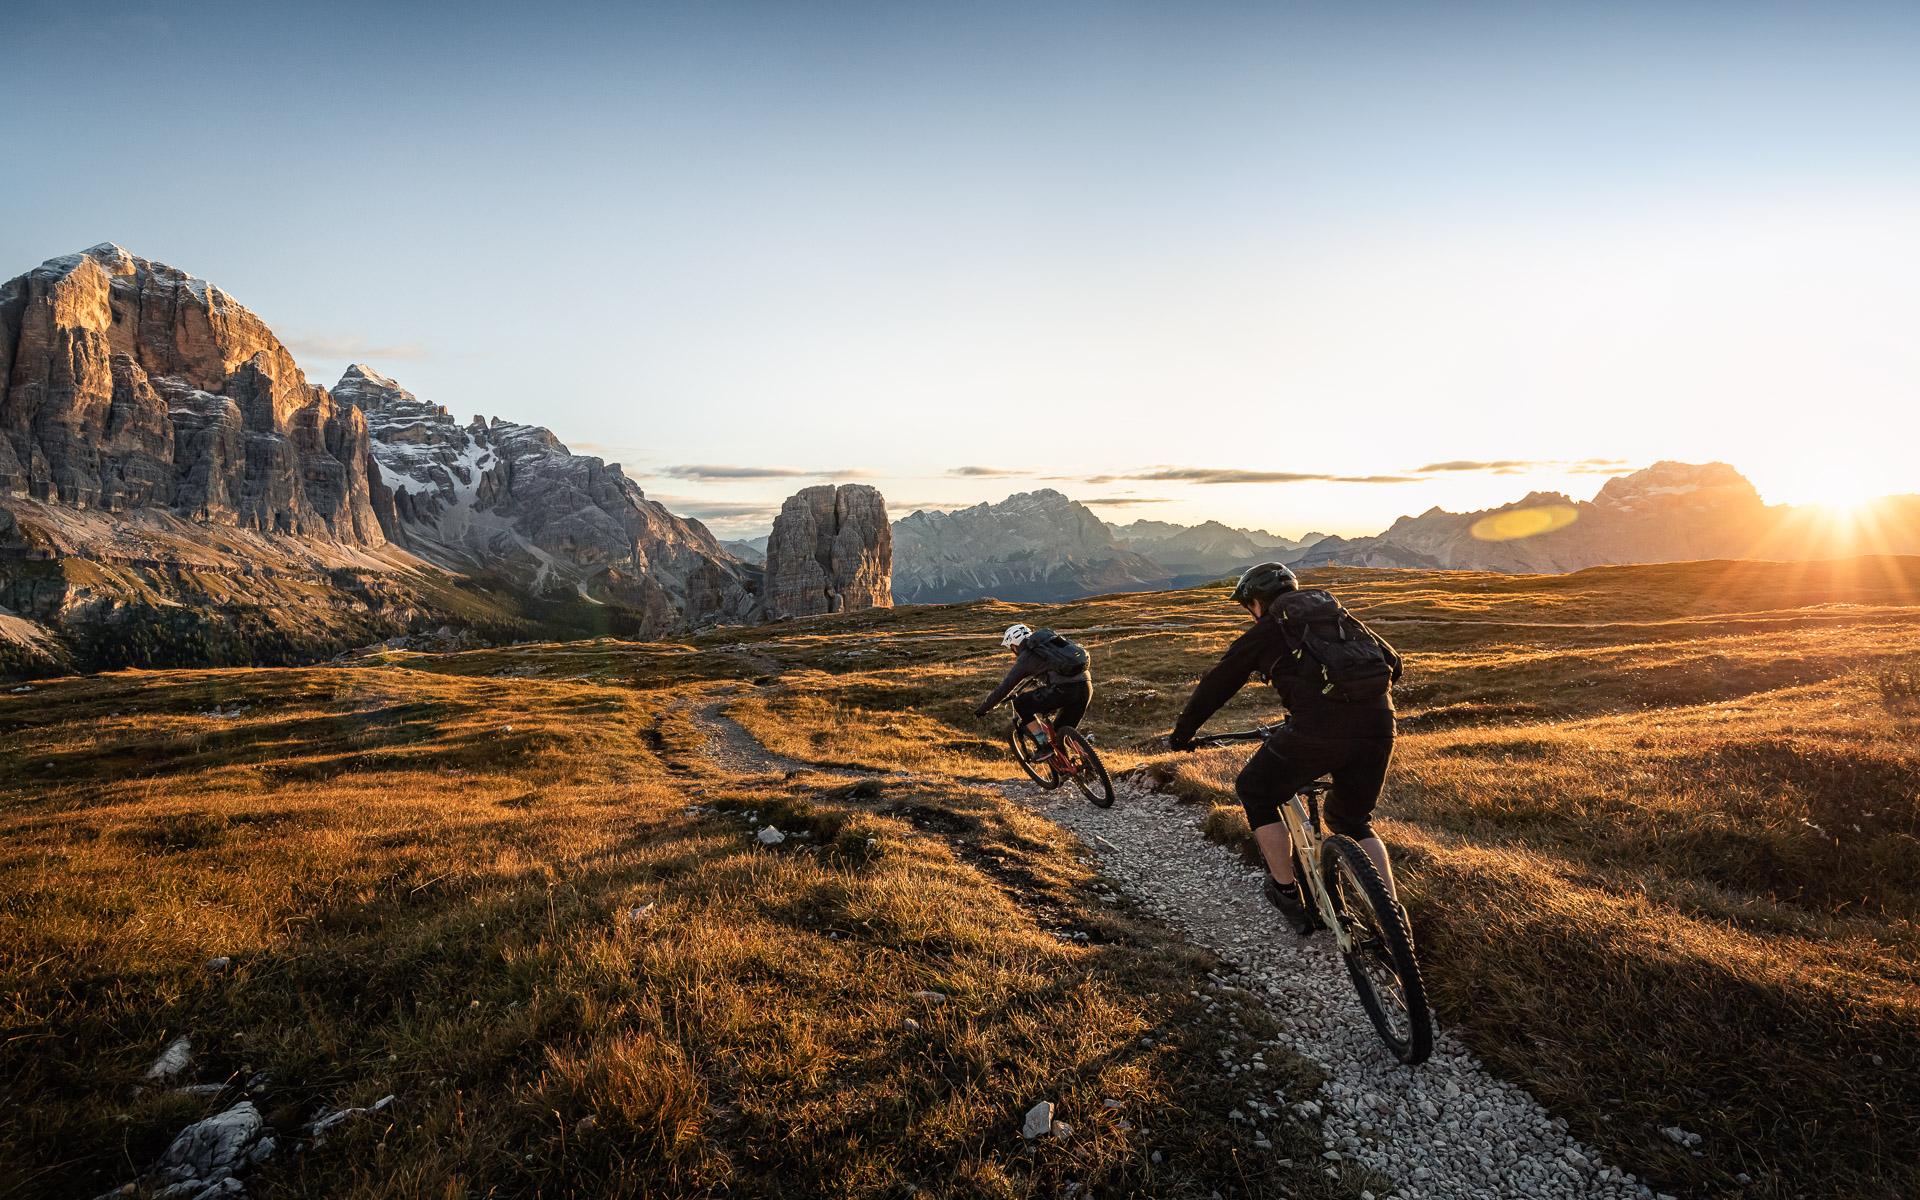 720-Protections-Cinque-Torri-Dolomites-2019-_W5A2848